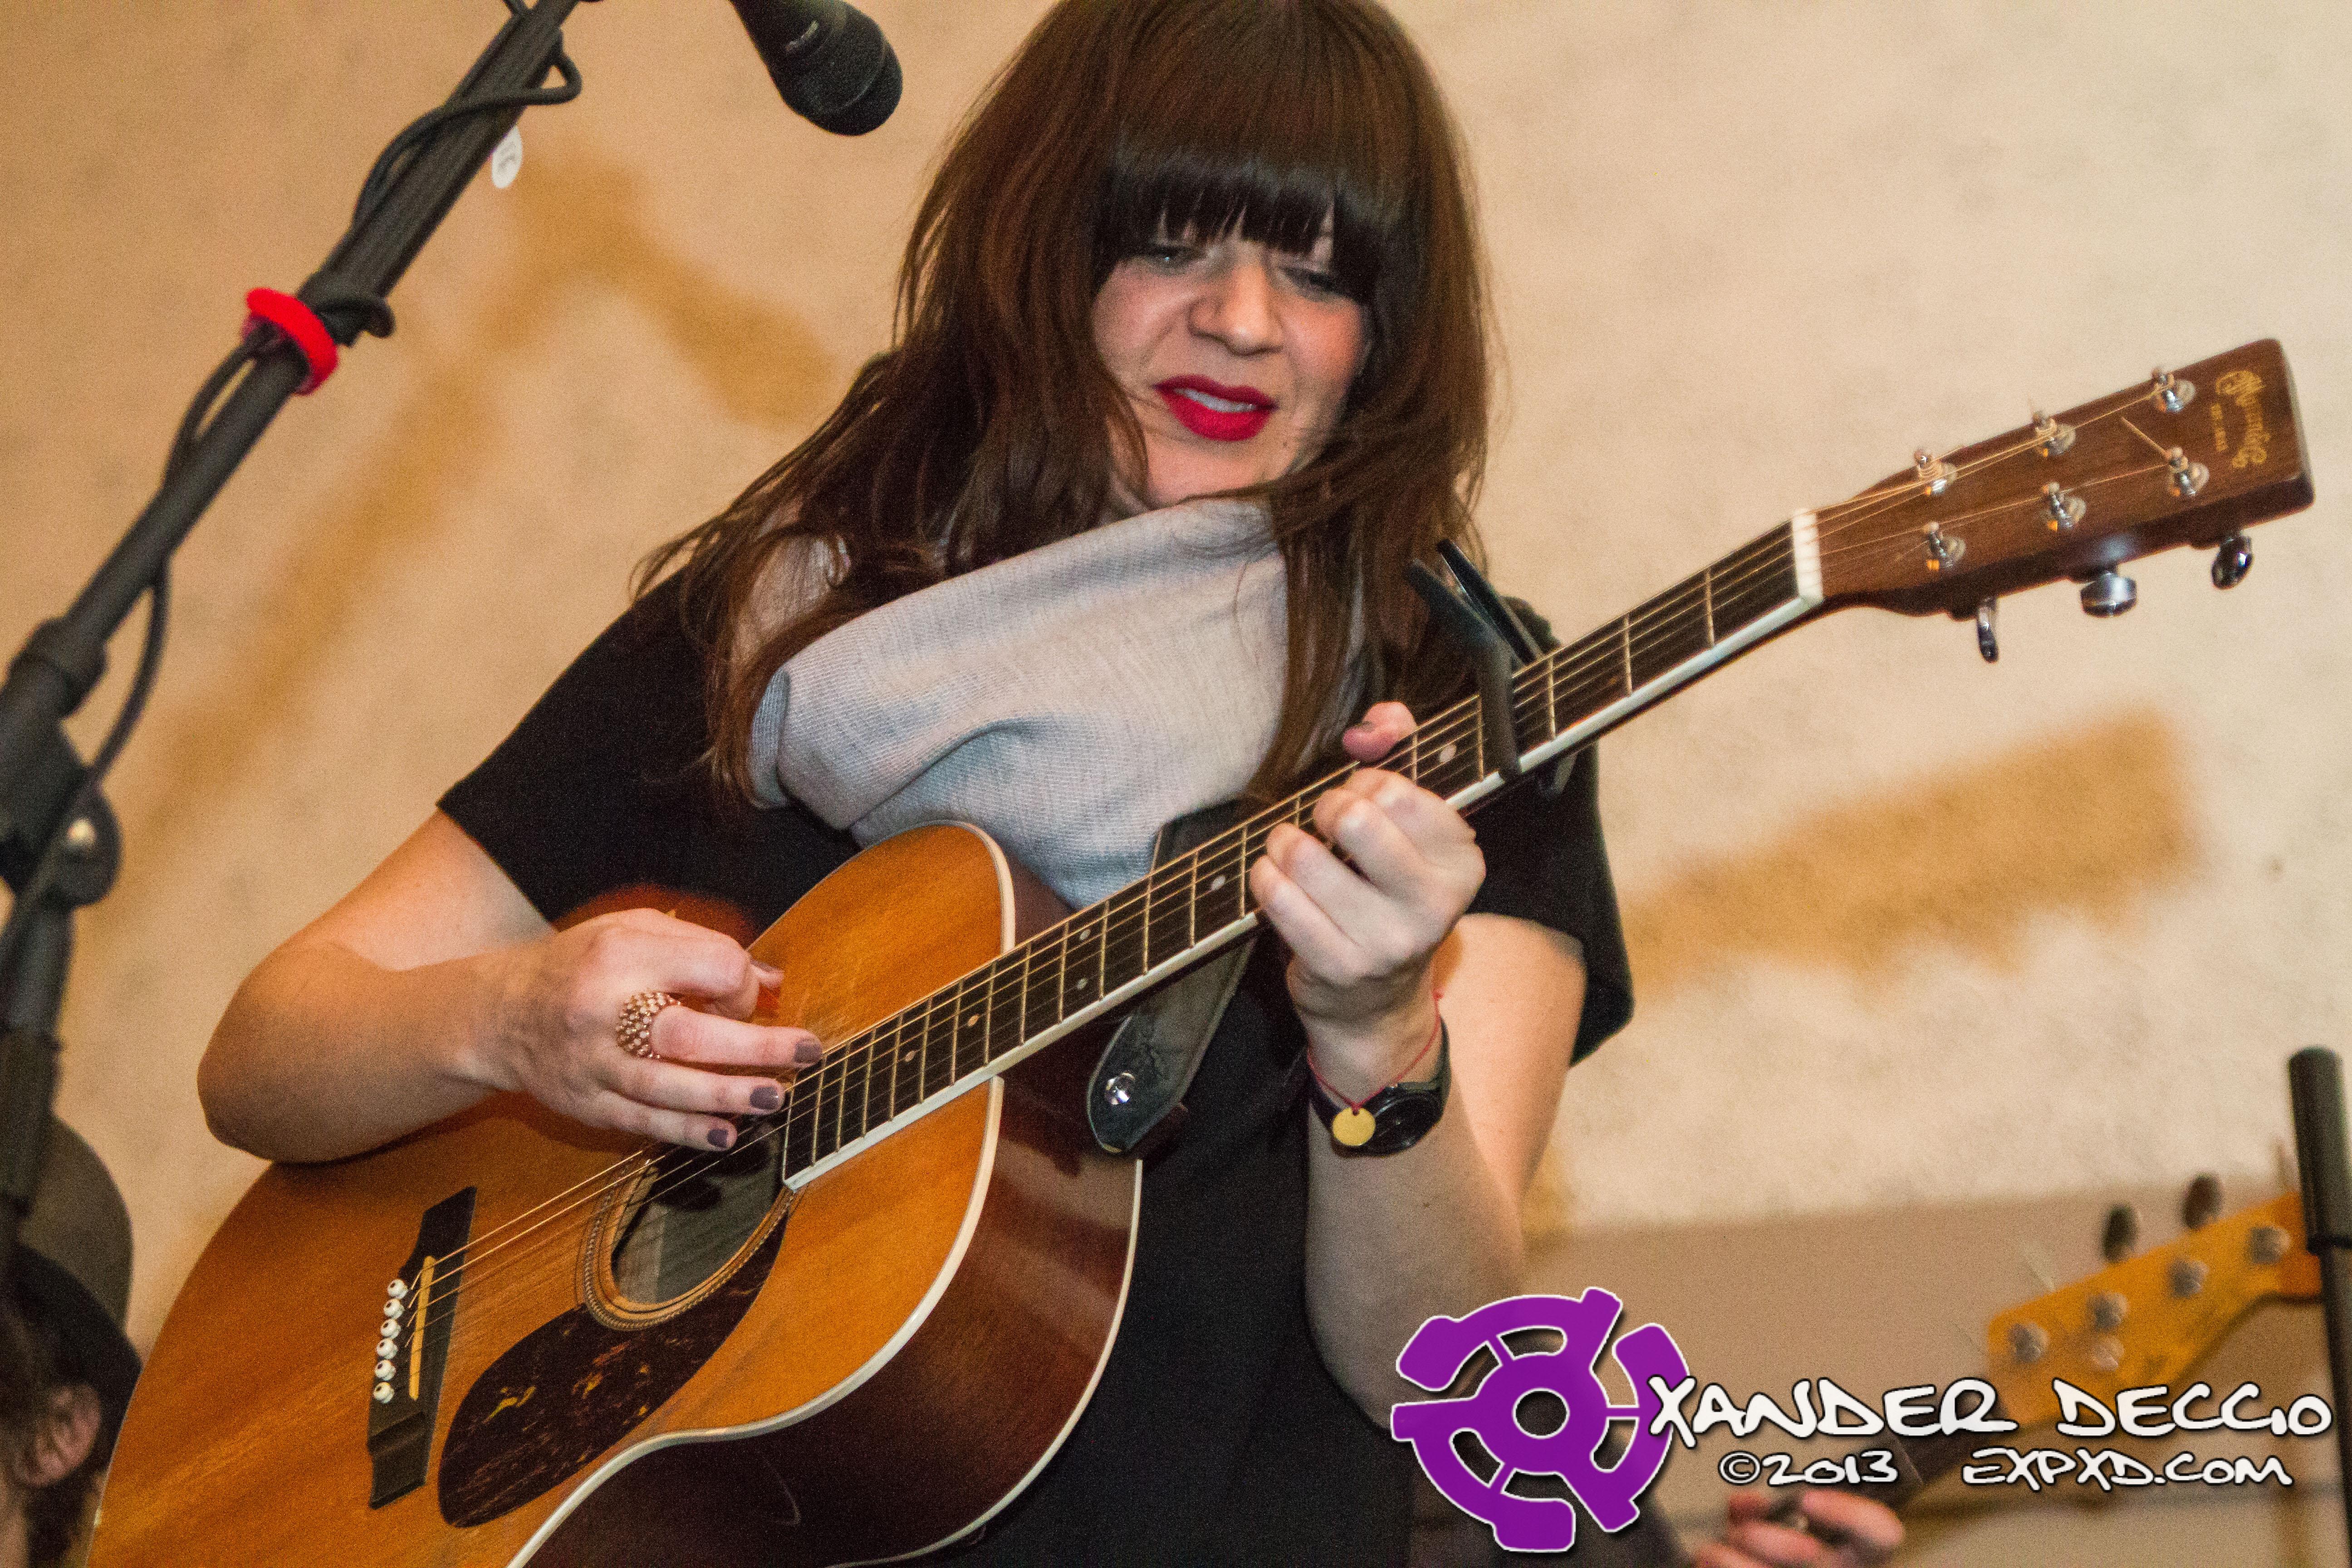 Shelby Earl @ The Seasons Performance Hall (Photo By Xander Deccio)